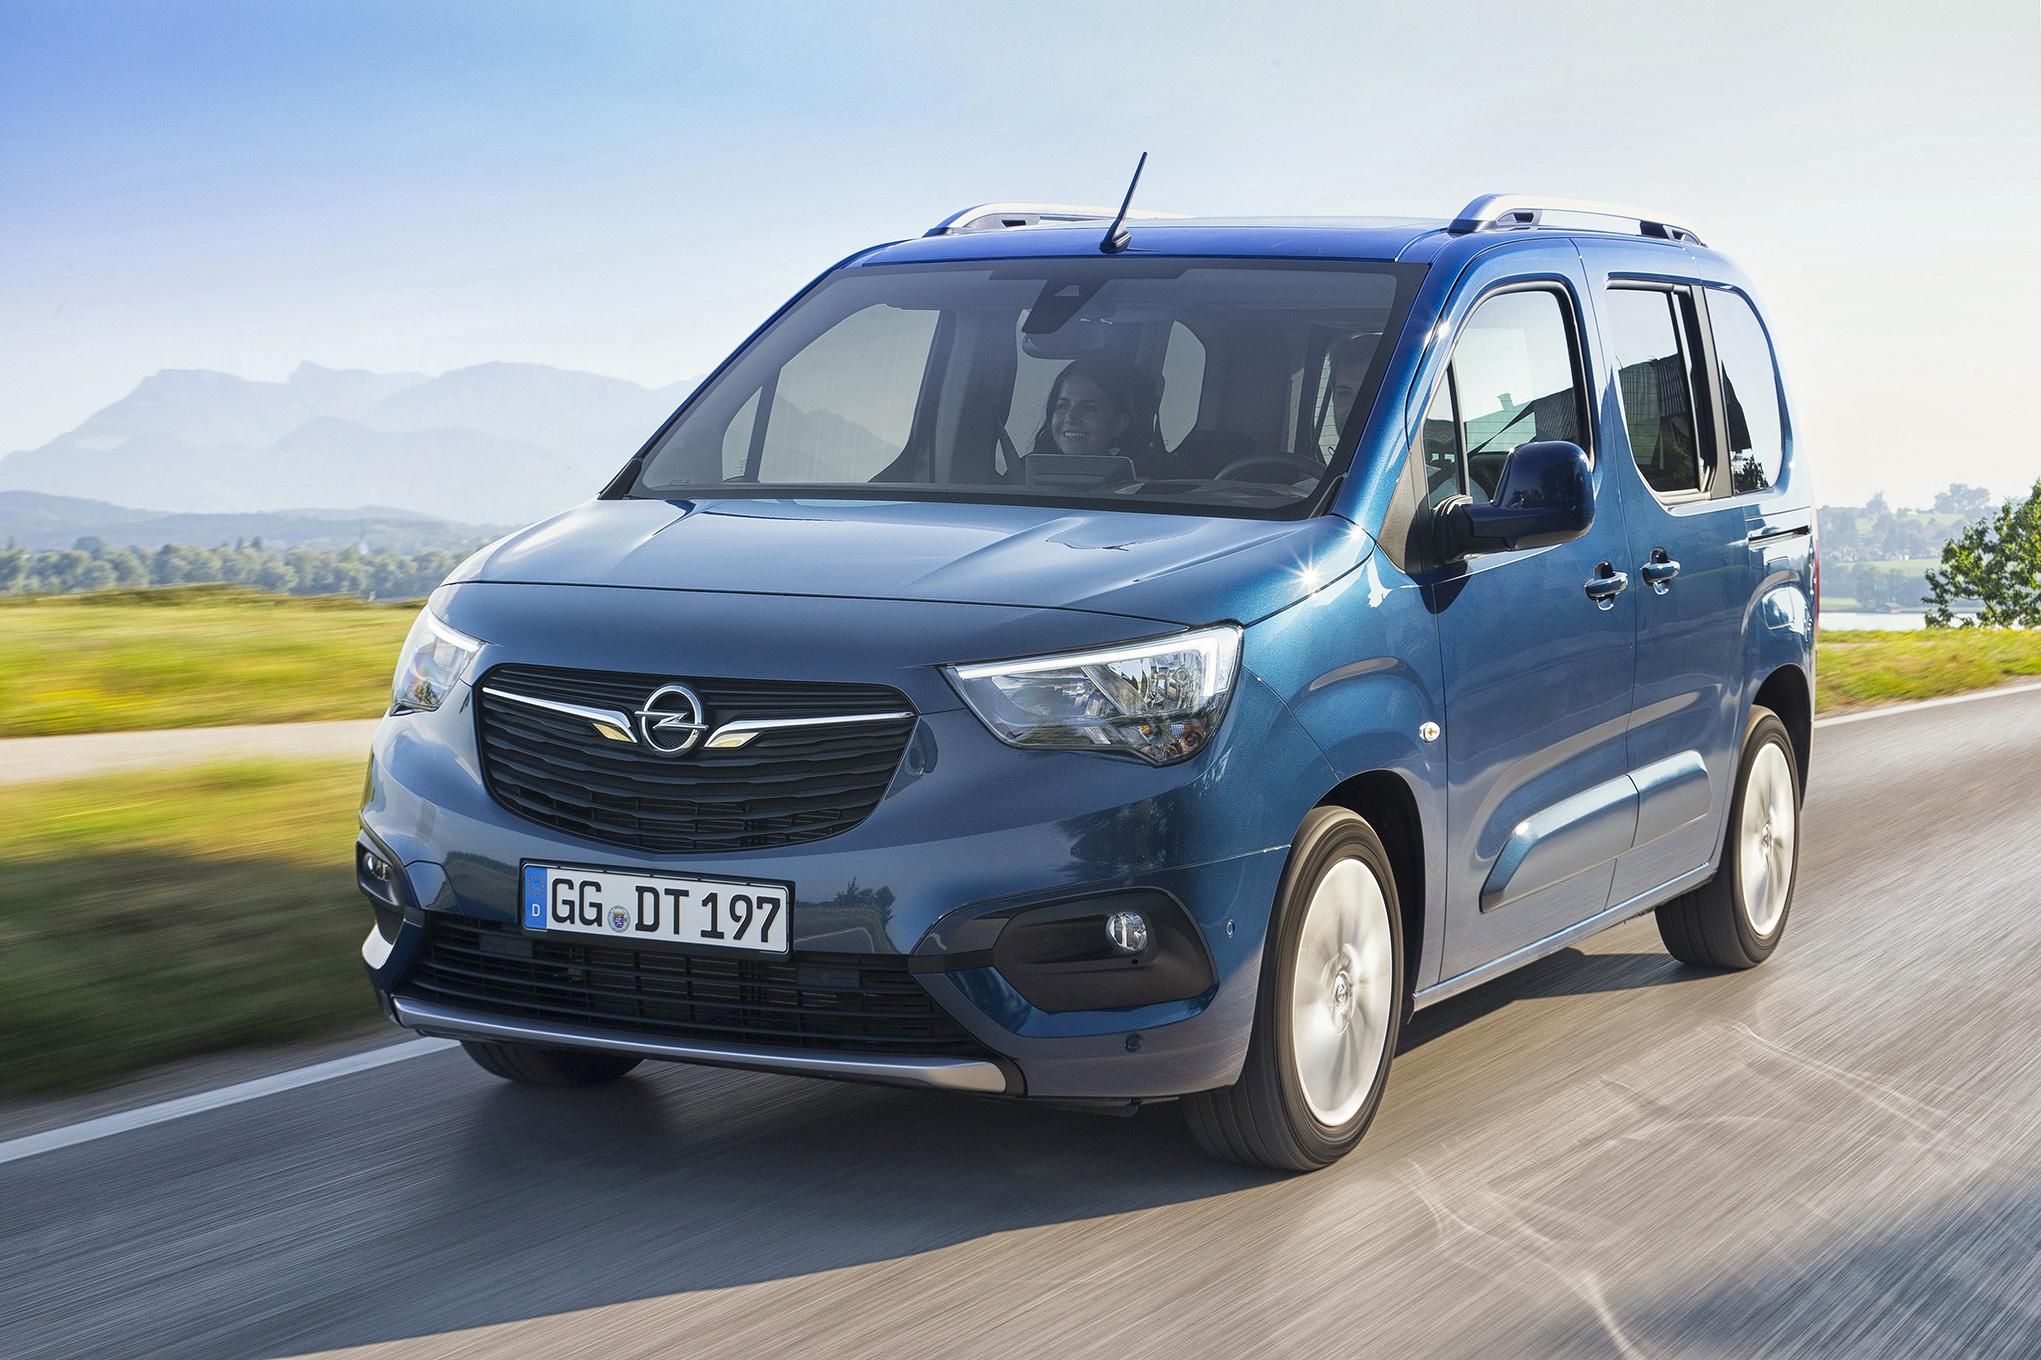 76 New Opel Neue Modelle Bis 2020 Release Date for Opel Neue Modelle Bis 2020